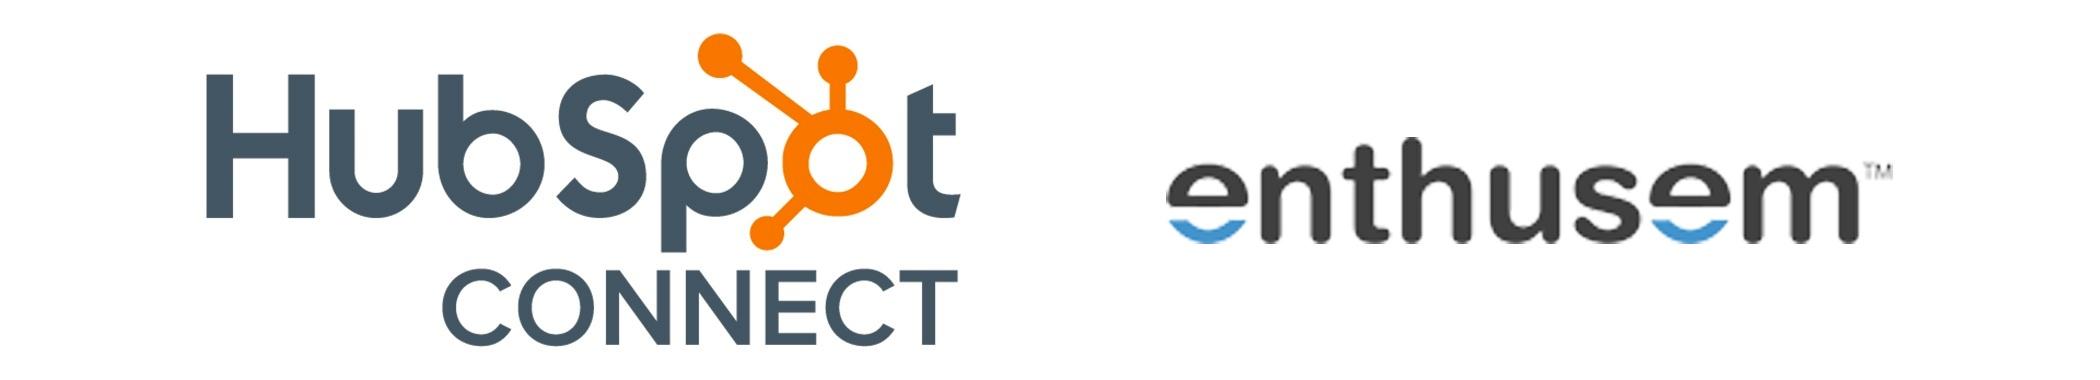 HubSpot-Enthusem Integration